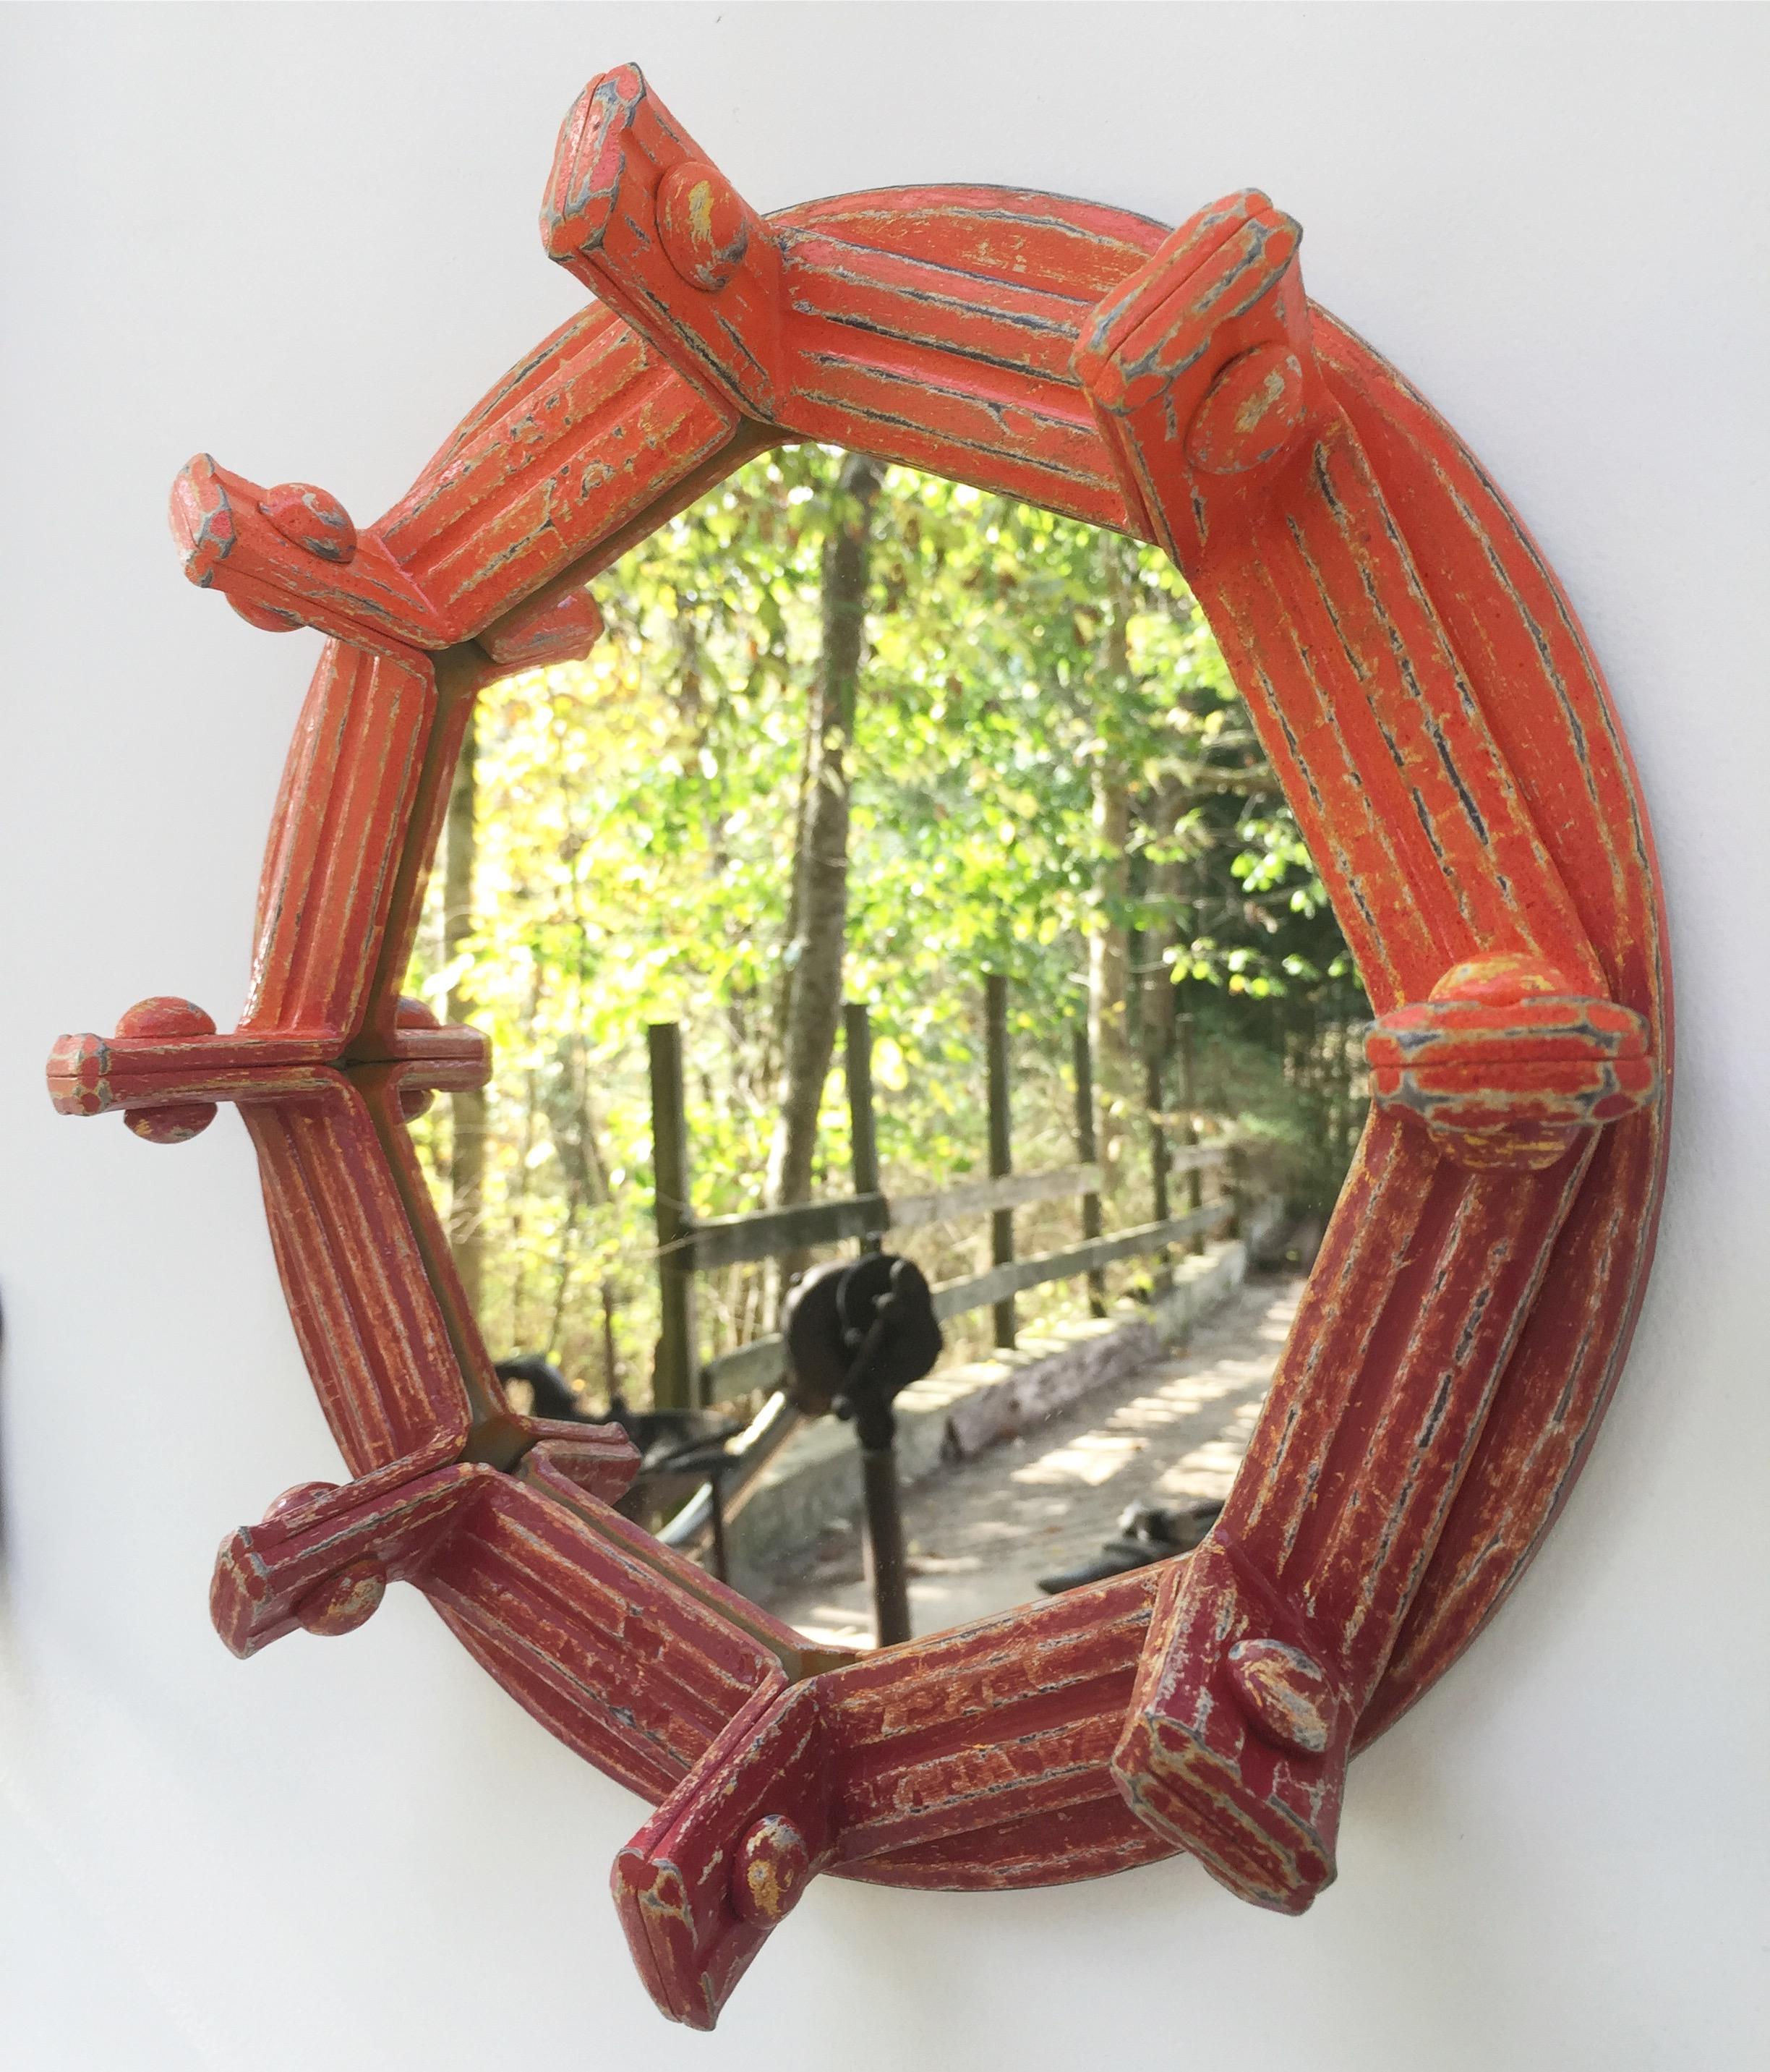 Octagonal Mirror, mild steel, paint, mirror, 2016